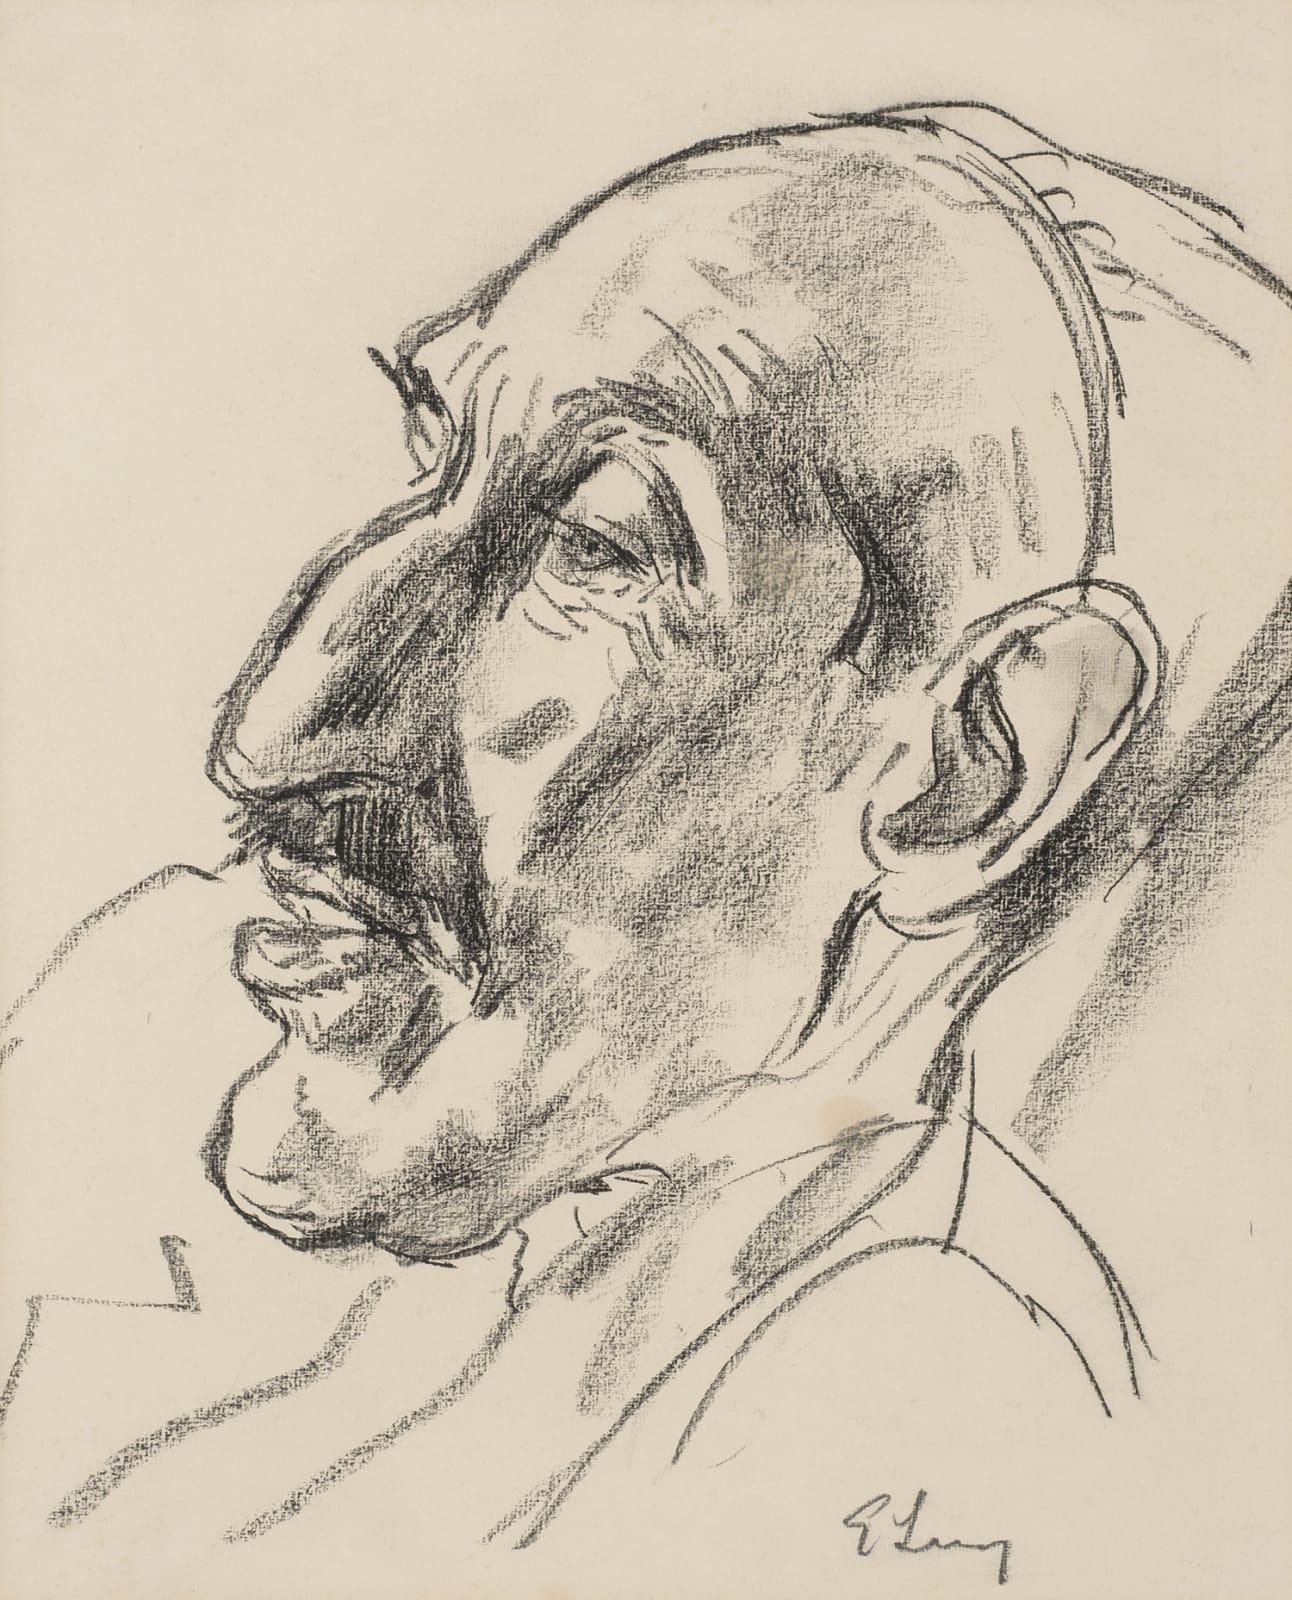 Emmanuel Levy (1900-1986) Portrait of Horace Brodzky n.d. Pencil on paper 38.4 x 30.5 cm Ben Uri Collection © Emmanuel Levy estate